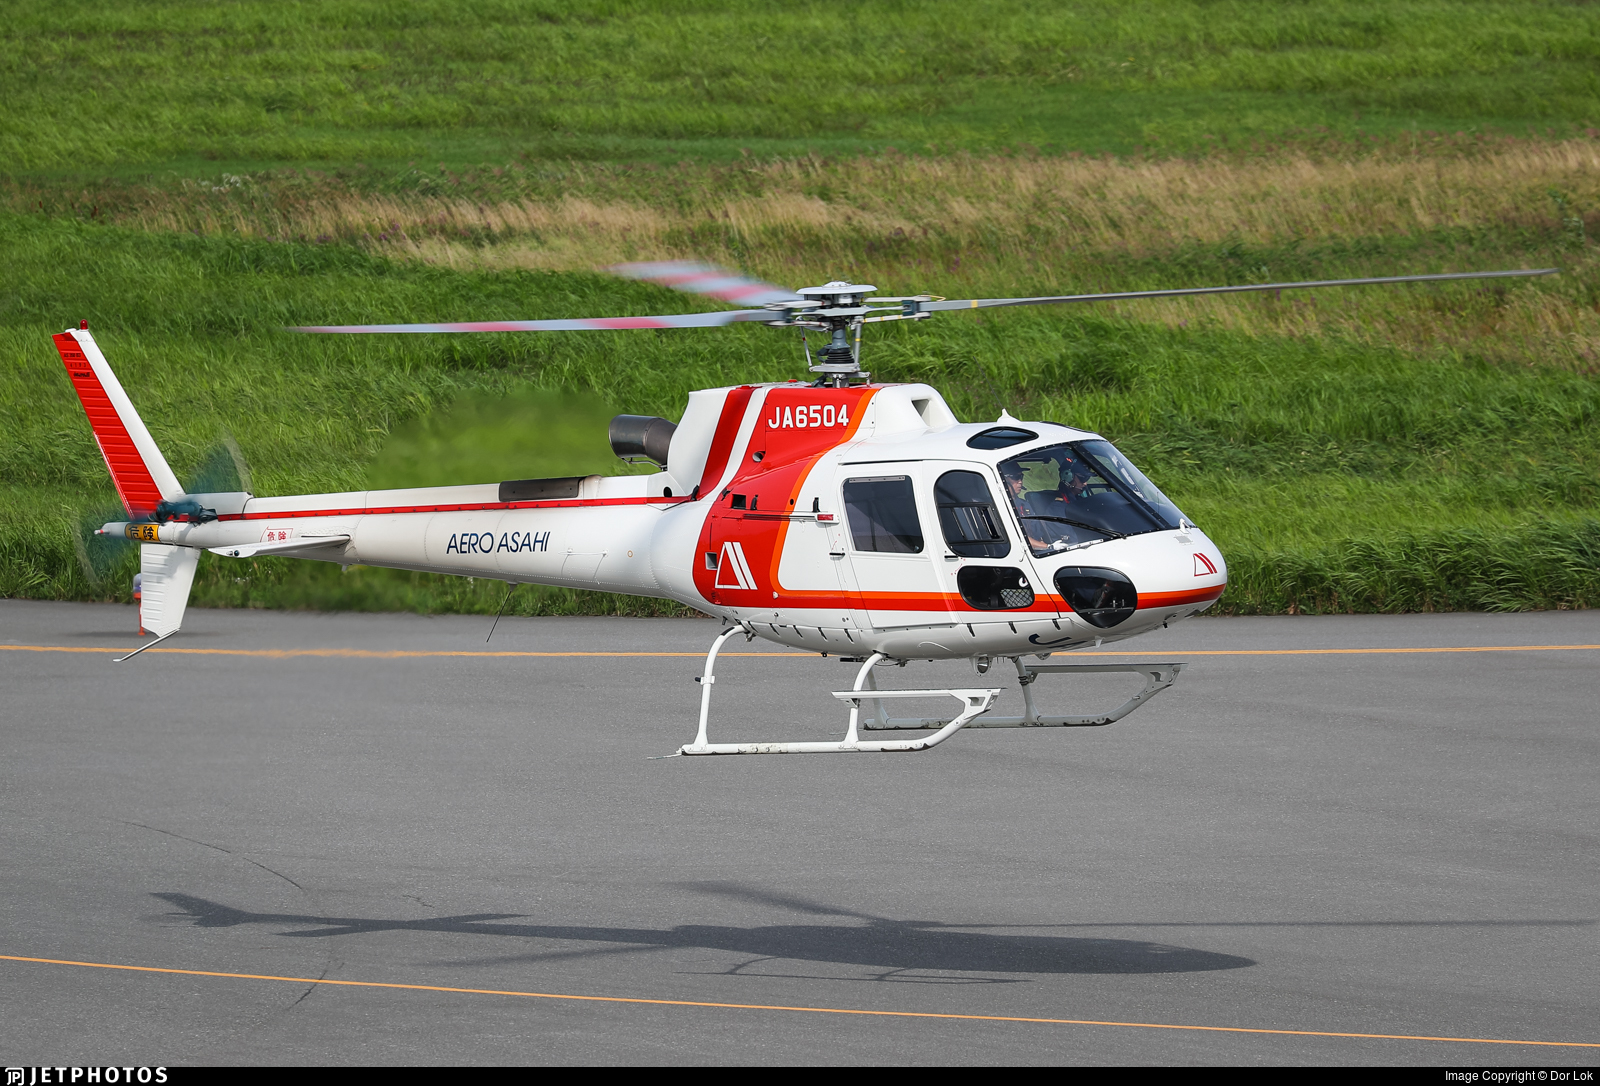 JA6504 - Eurocopter AS 350B3 Ecureuil - Aero Asahi